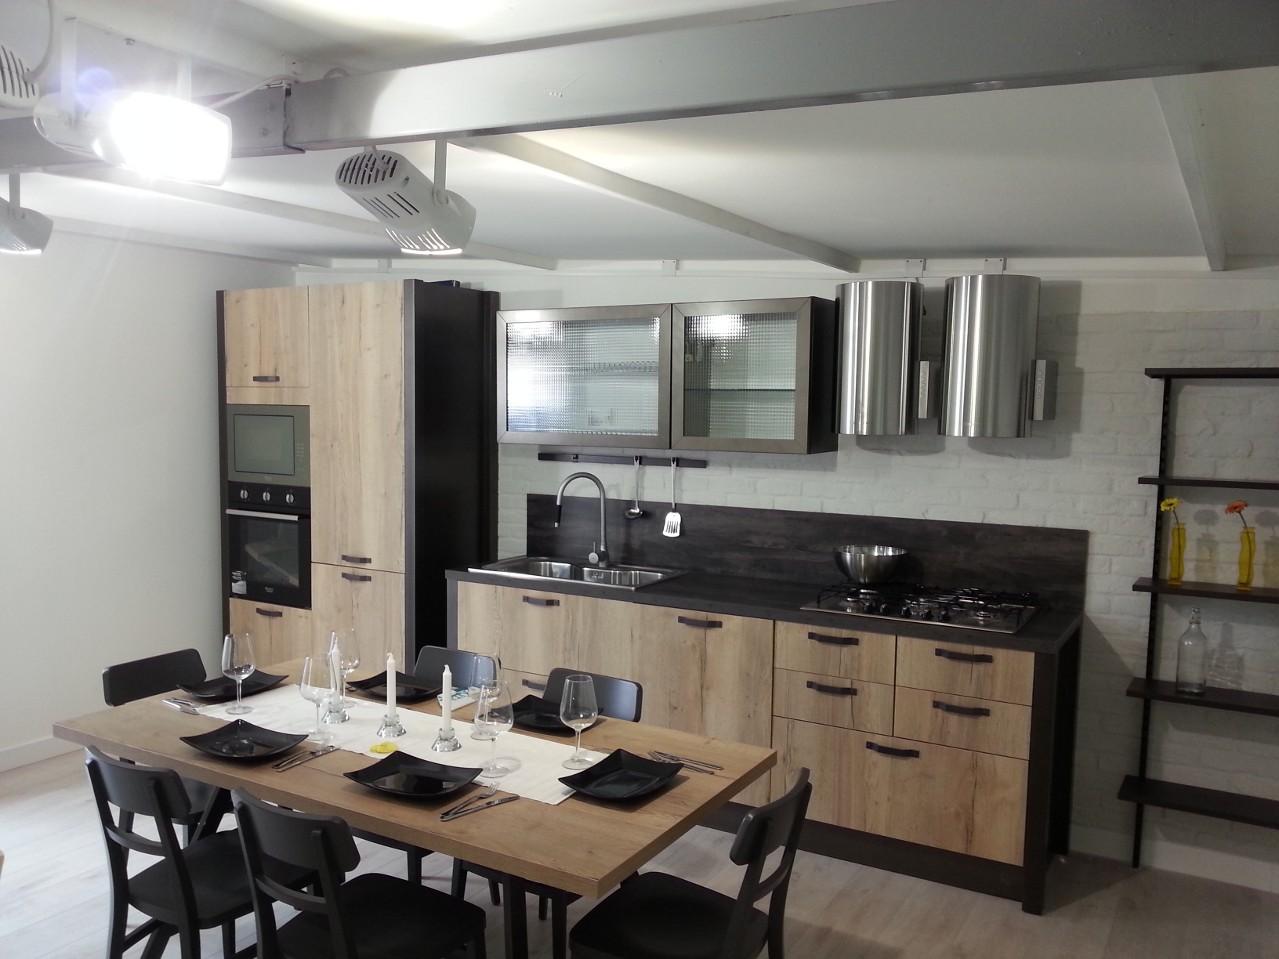 Cucina mattone b trep rm 14 rinnovare con la pietra - Rivestimento cucina finta pietra ...